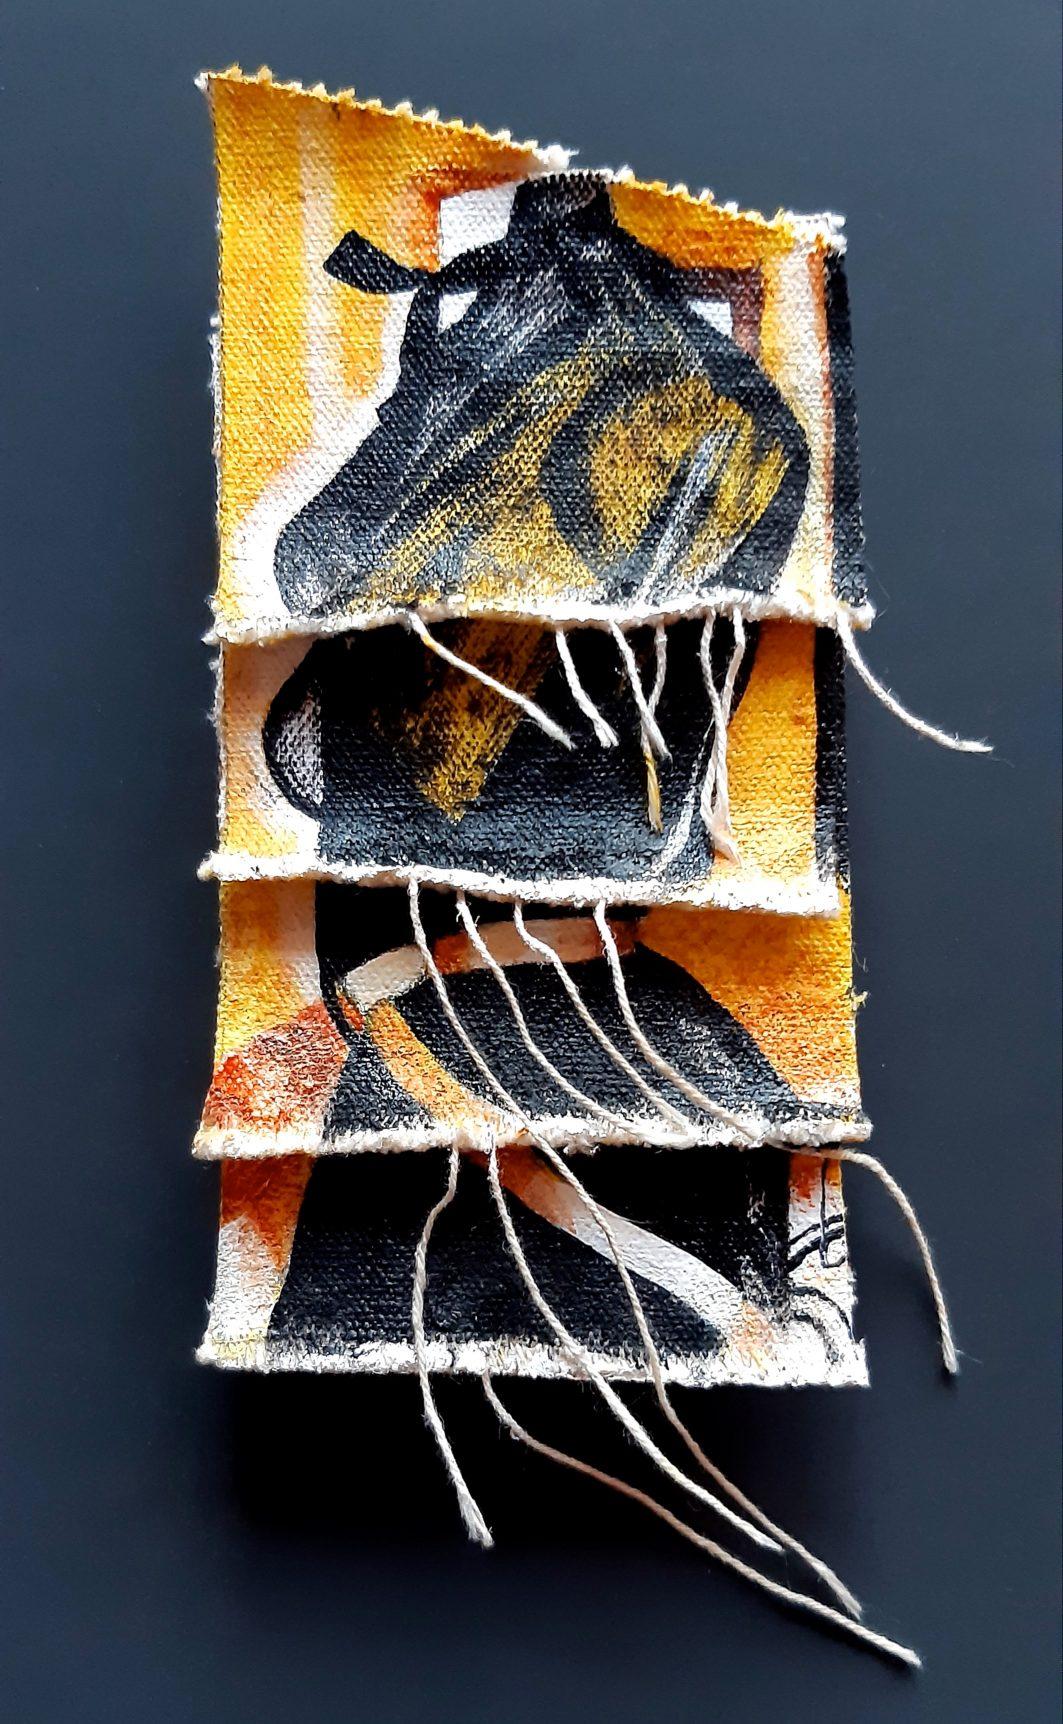 Layered canvas